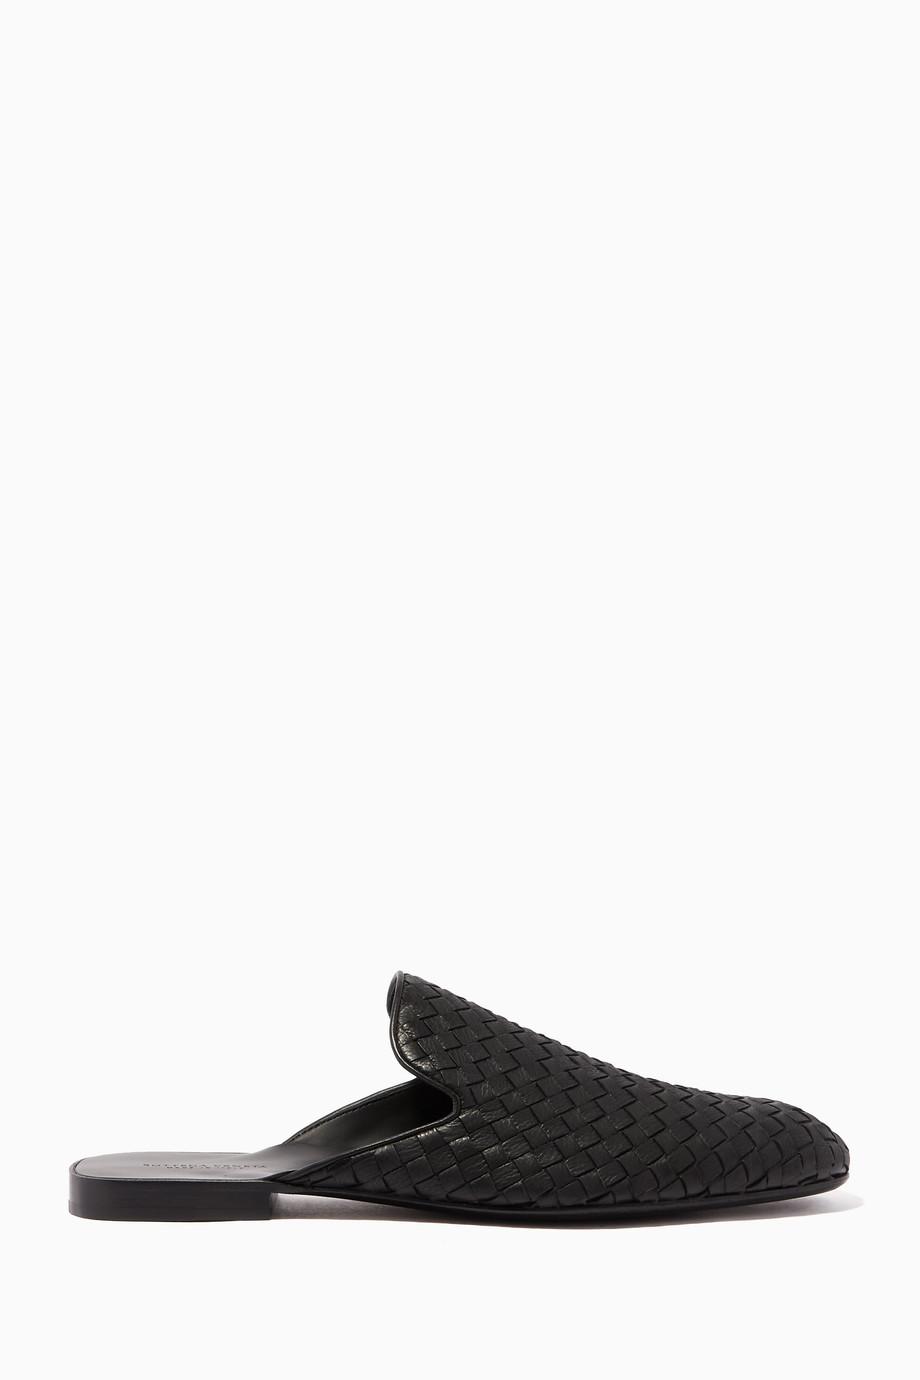 e67905418299 Black Intrecciato Slippers Black Intrecciato Slippers Black Intrecciato  Slippers Black Intrecciato Slippers. Bottega Veneta